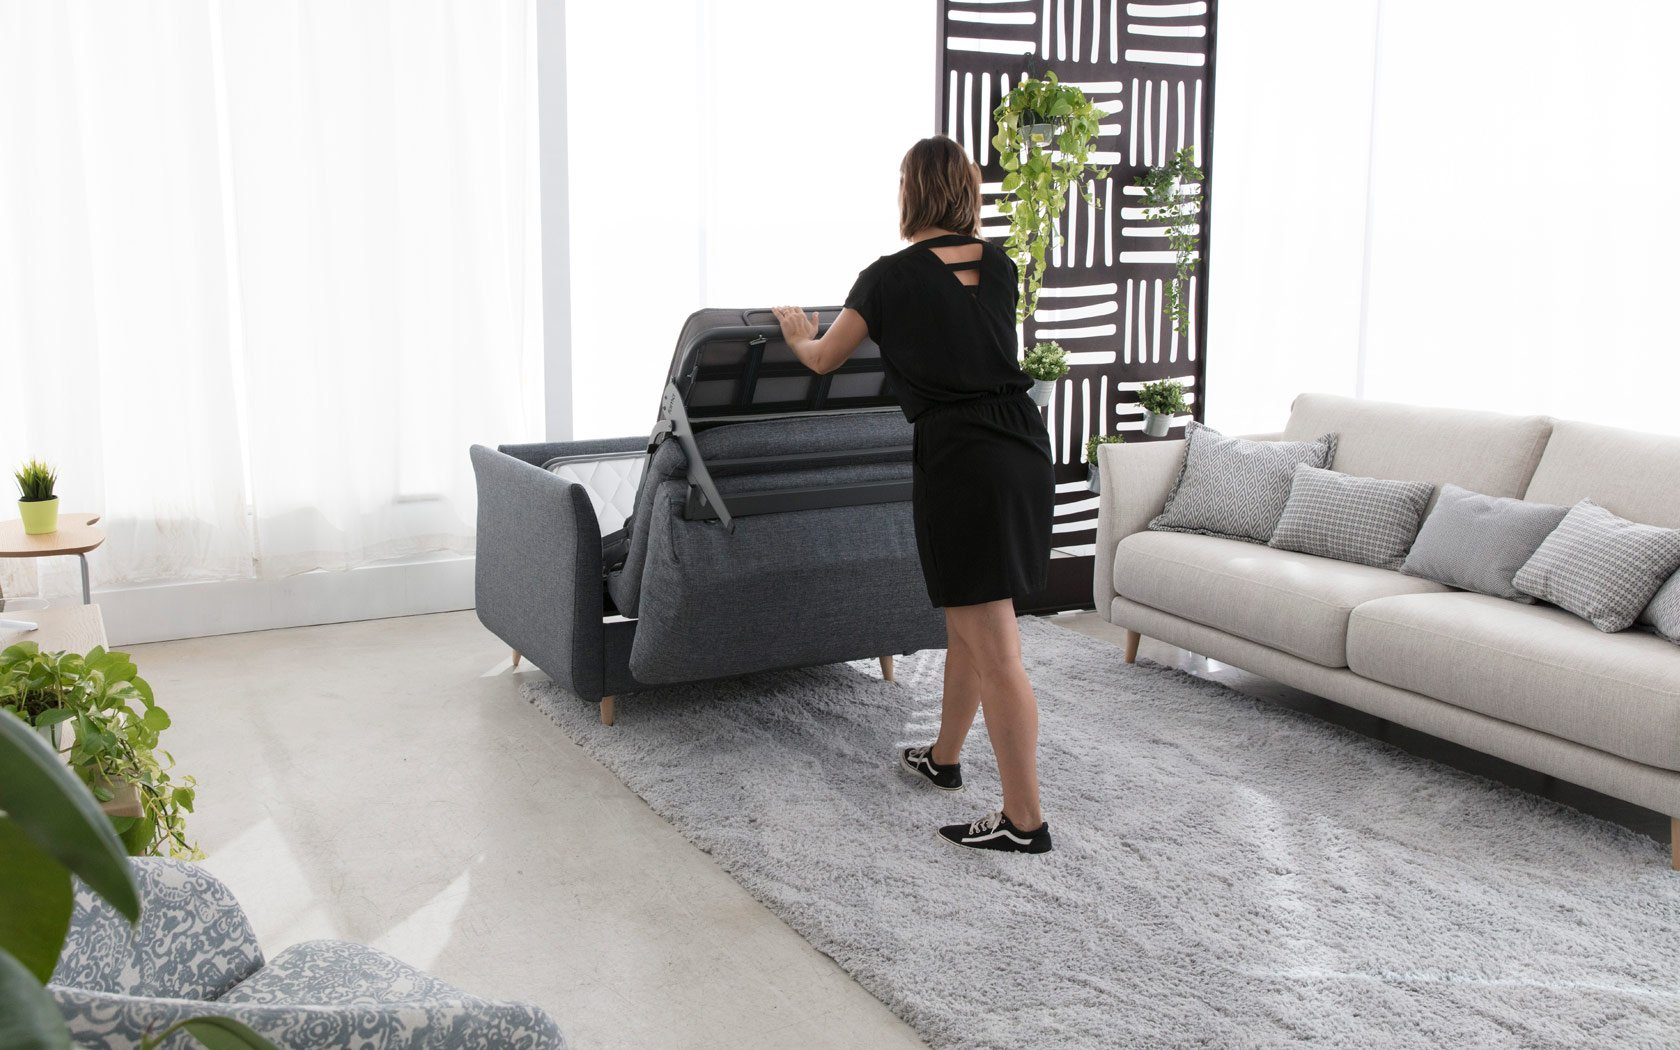 Helsinki sillón cama 2020 04